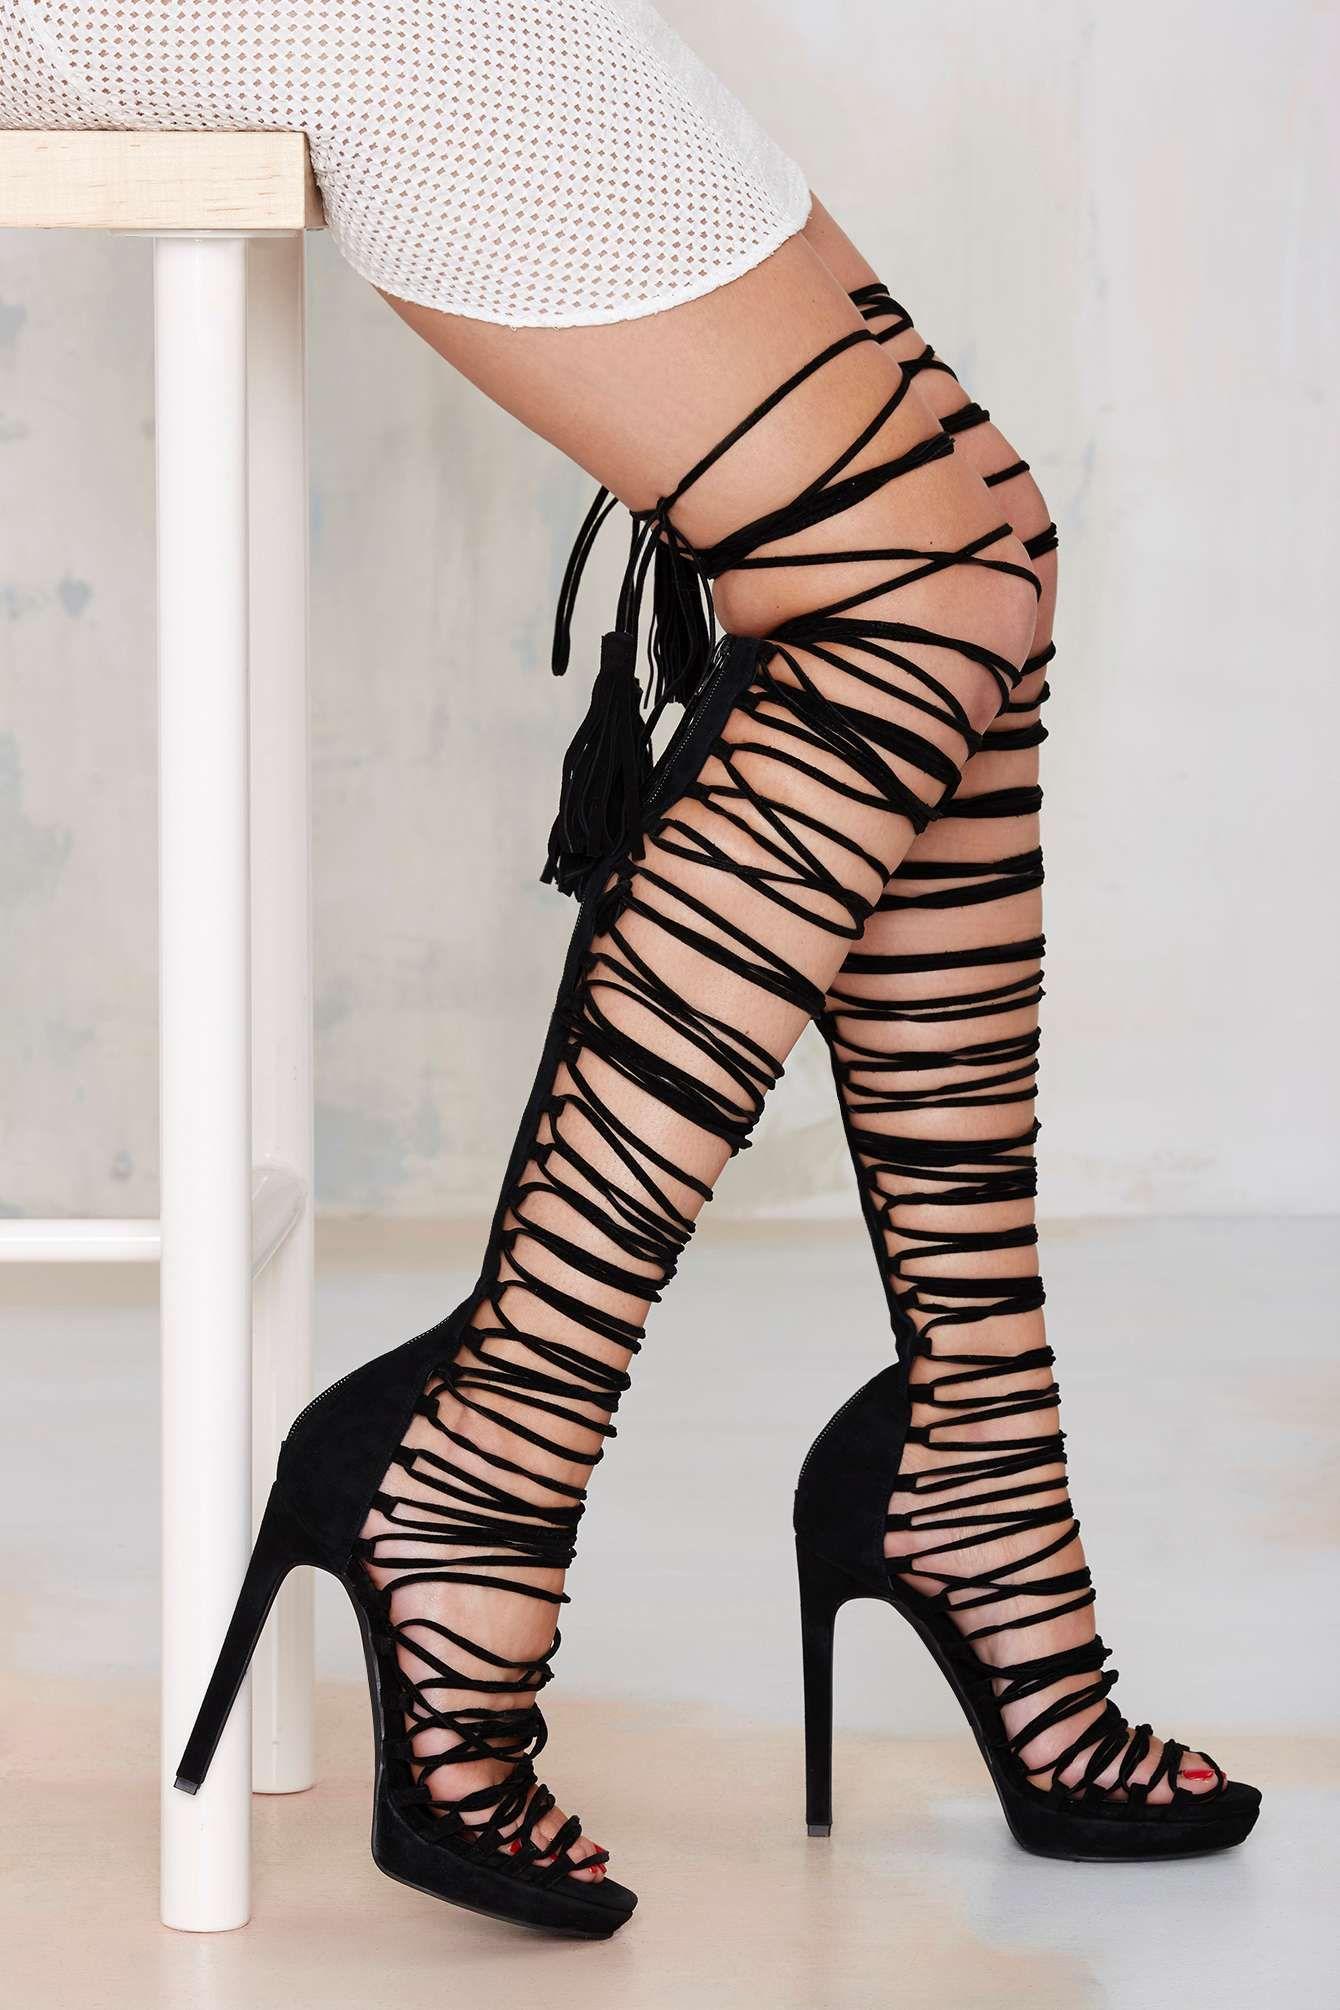 High Heels   Shop Lace Up, Stilettos, Suede & More